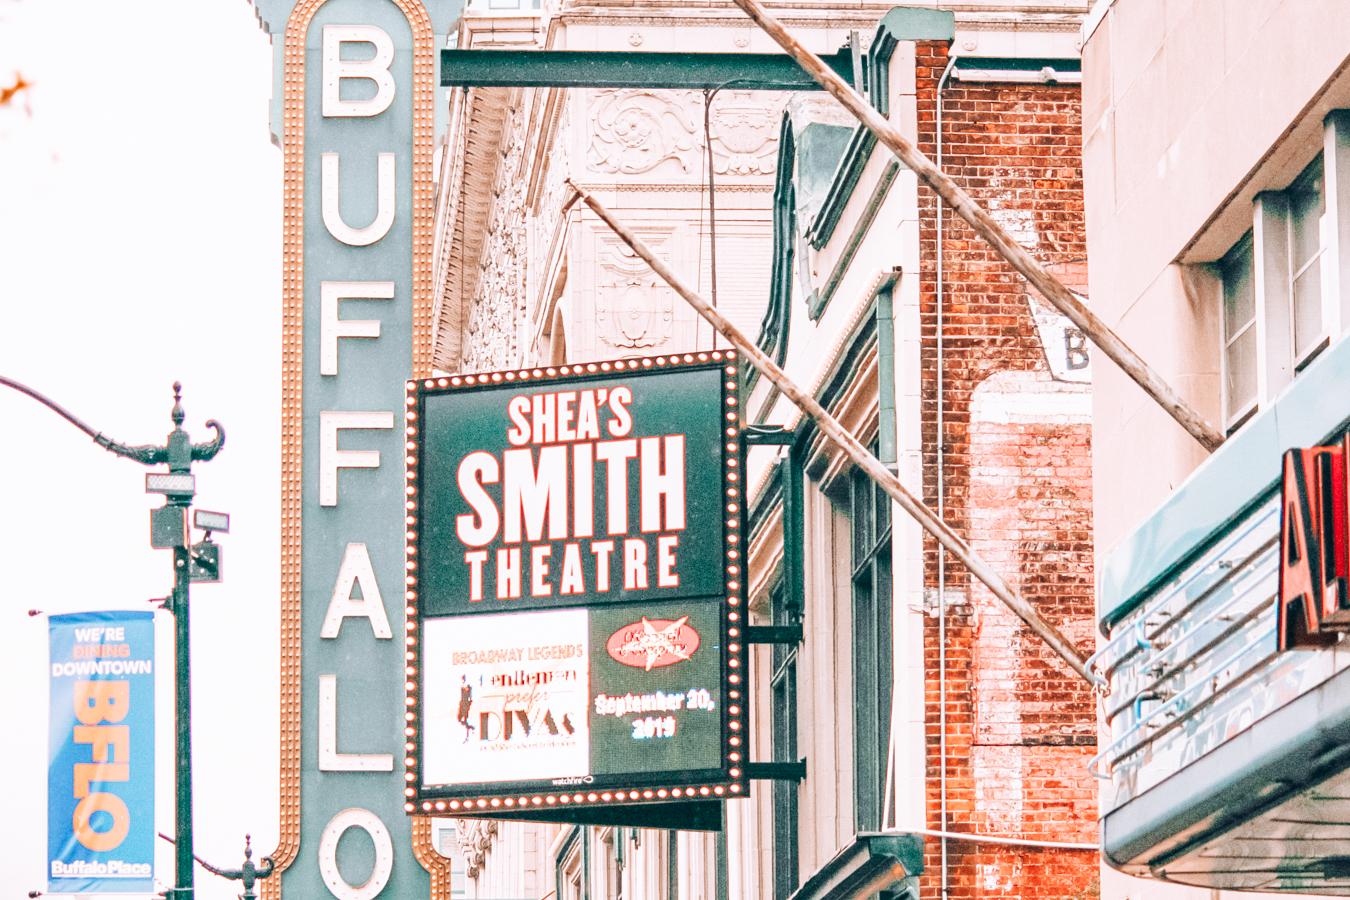 Signs in Buffalo